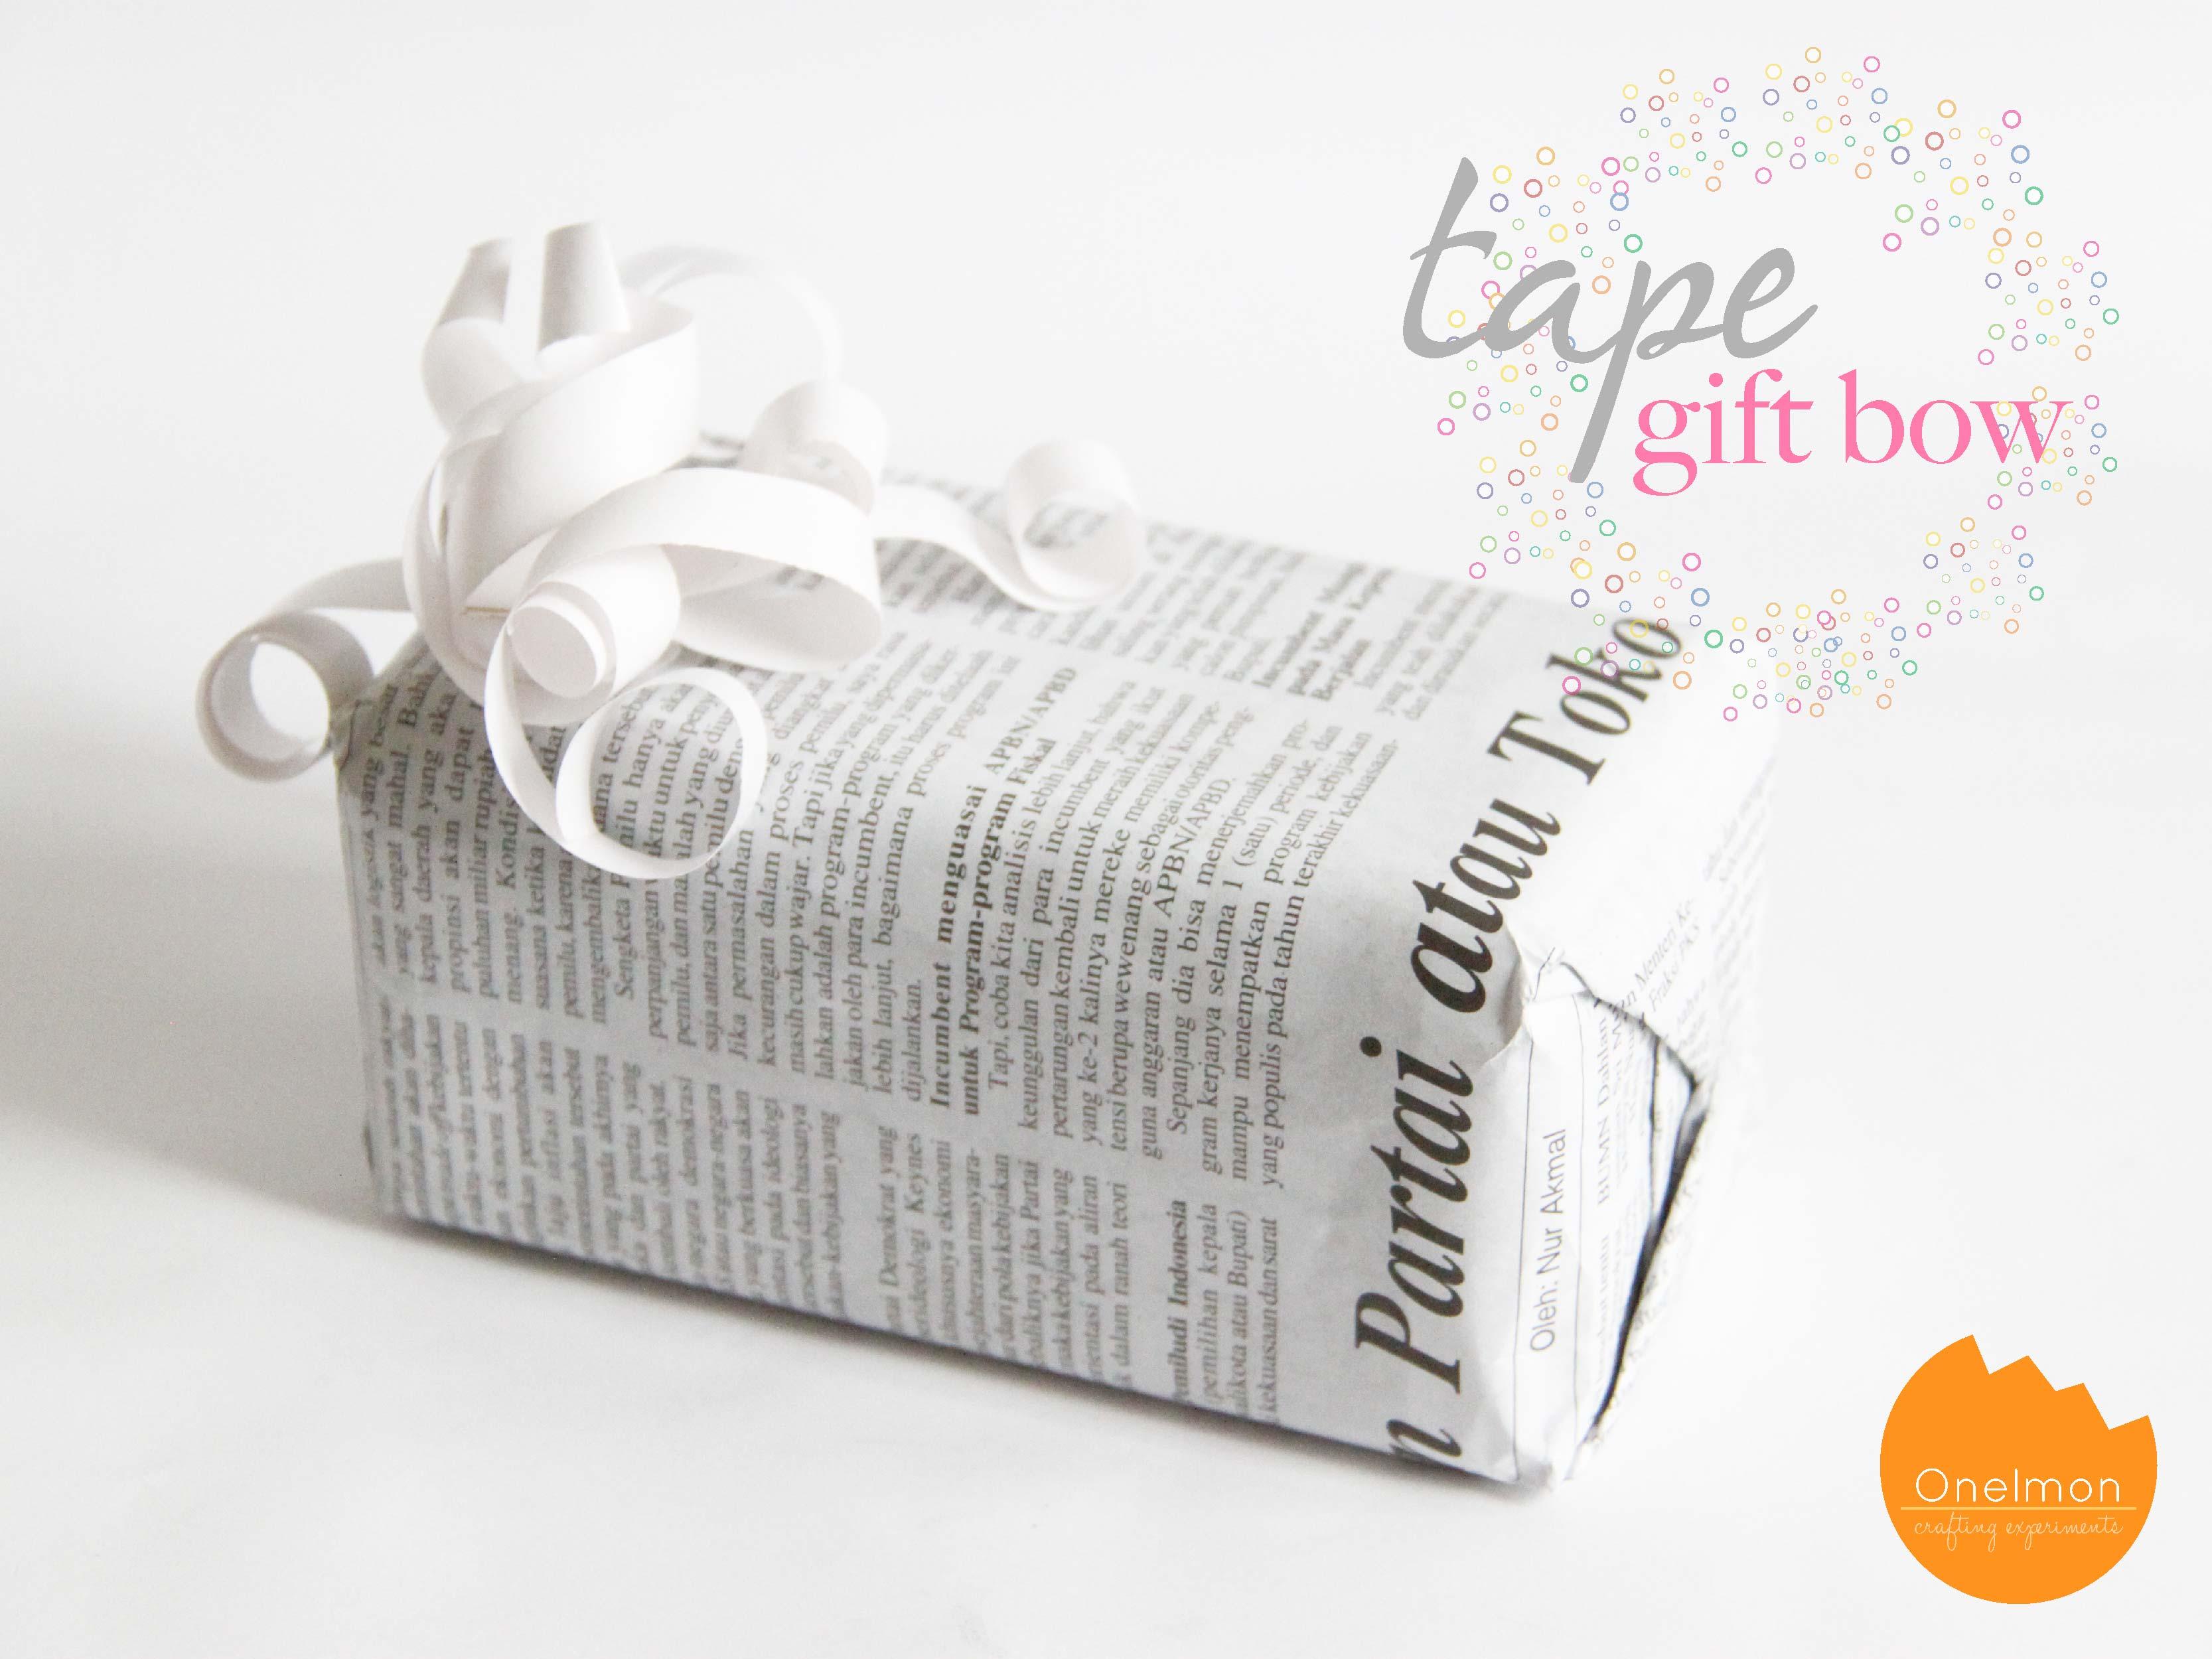 Diy Tape Gift Bow Onelmon